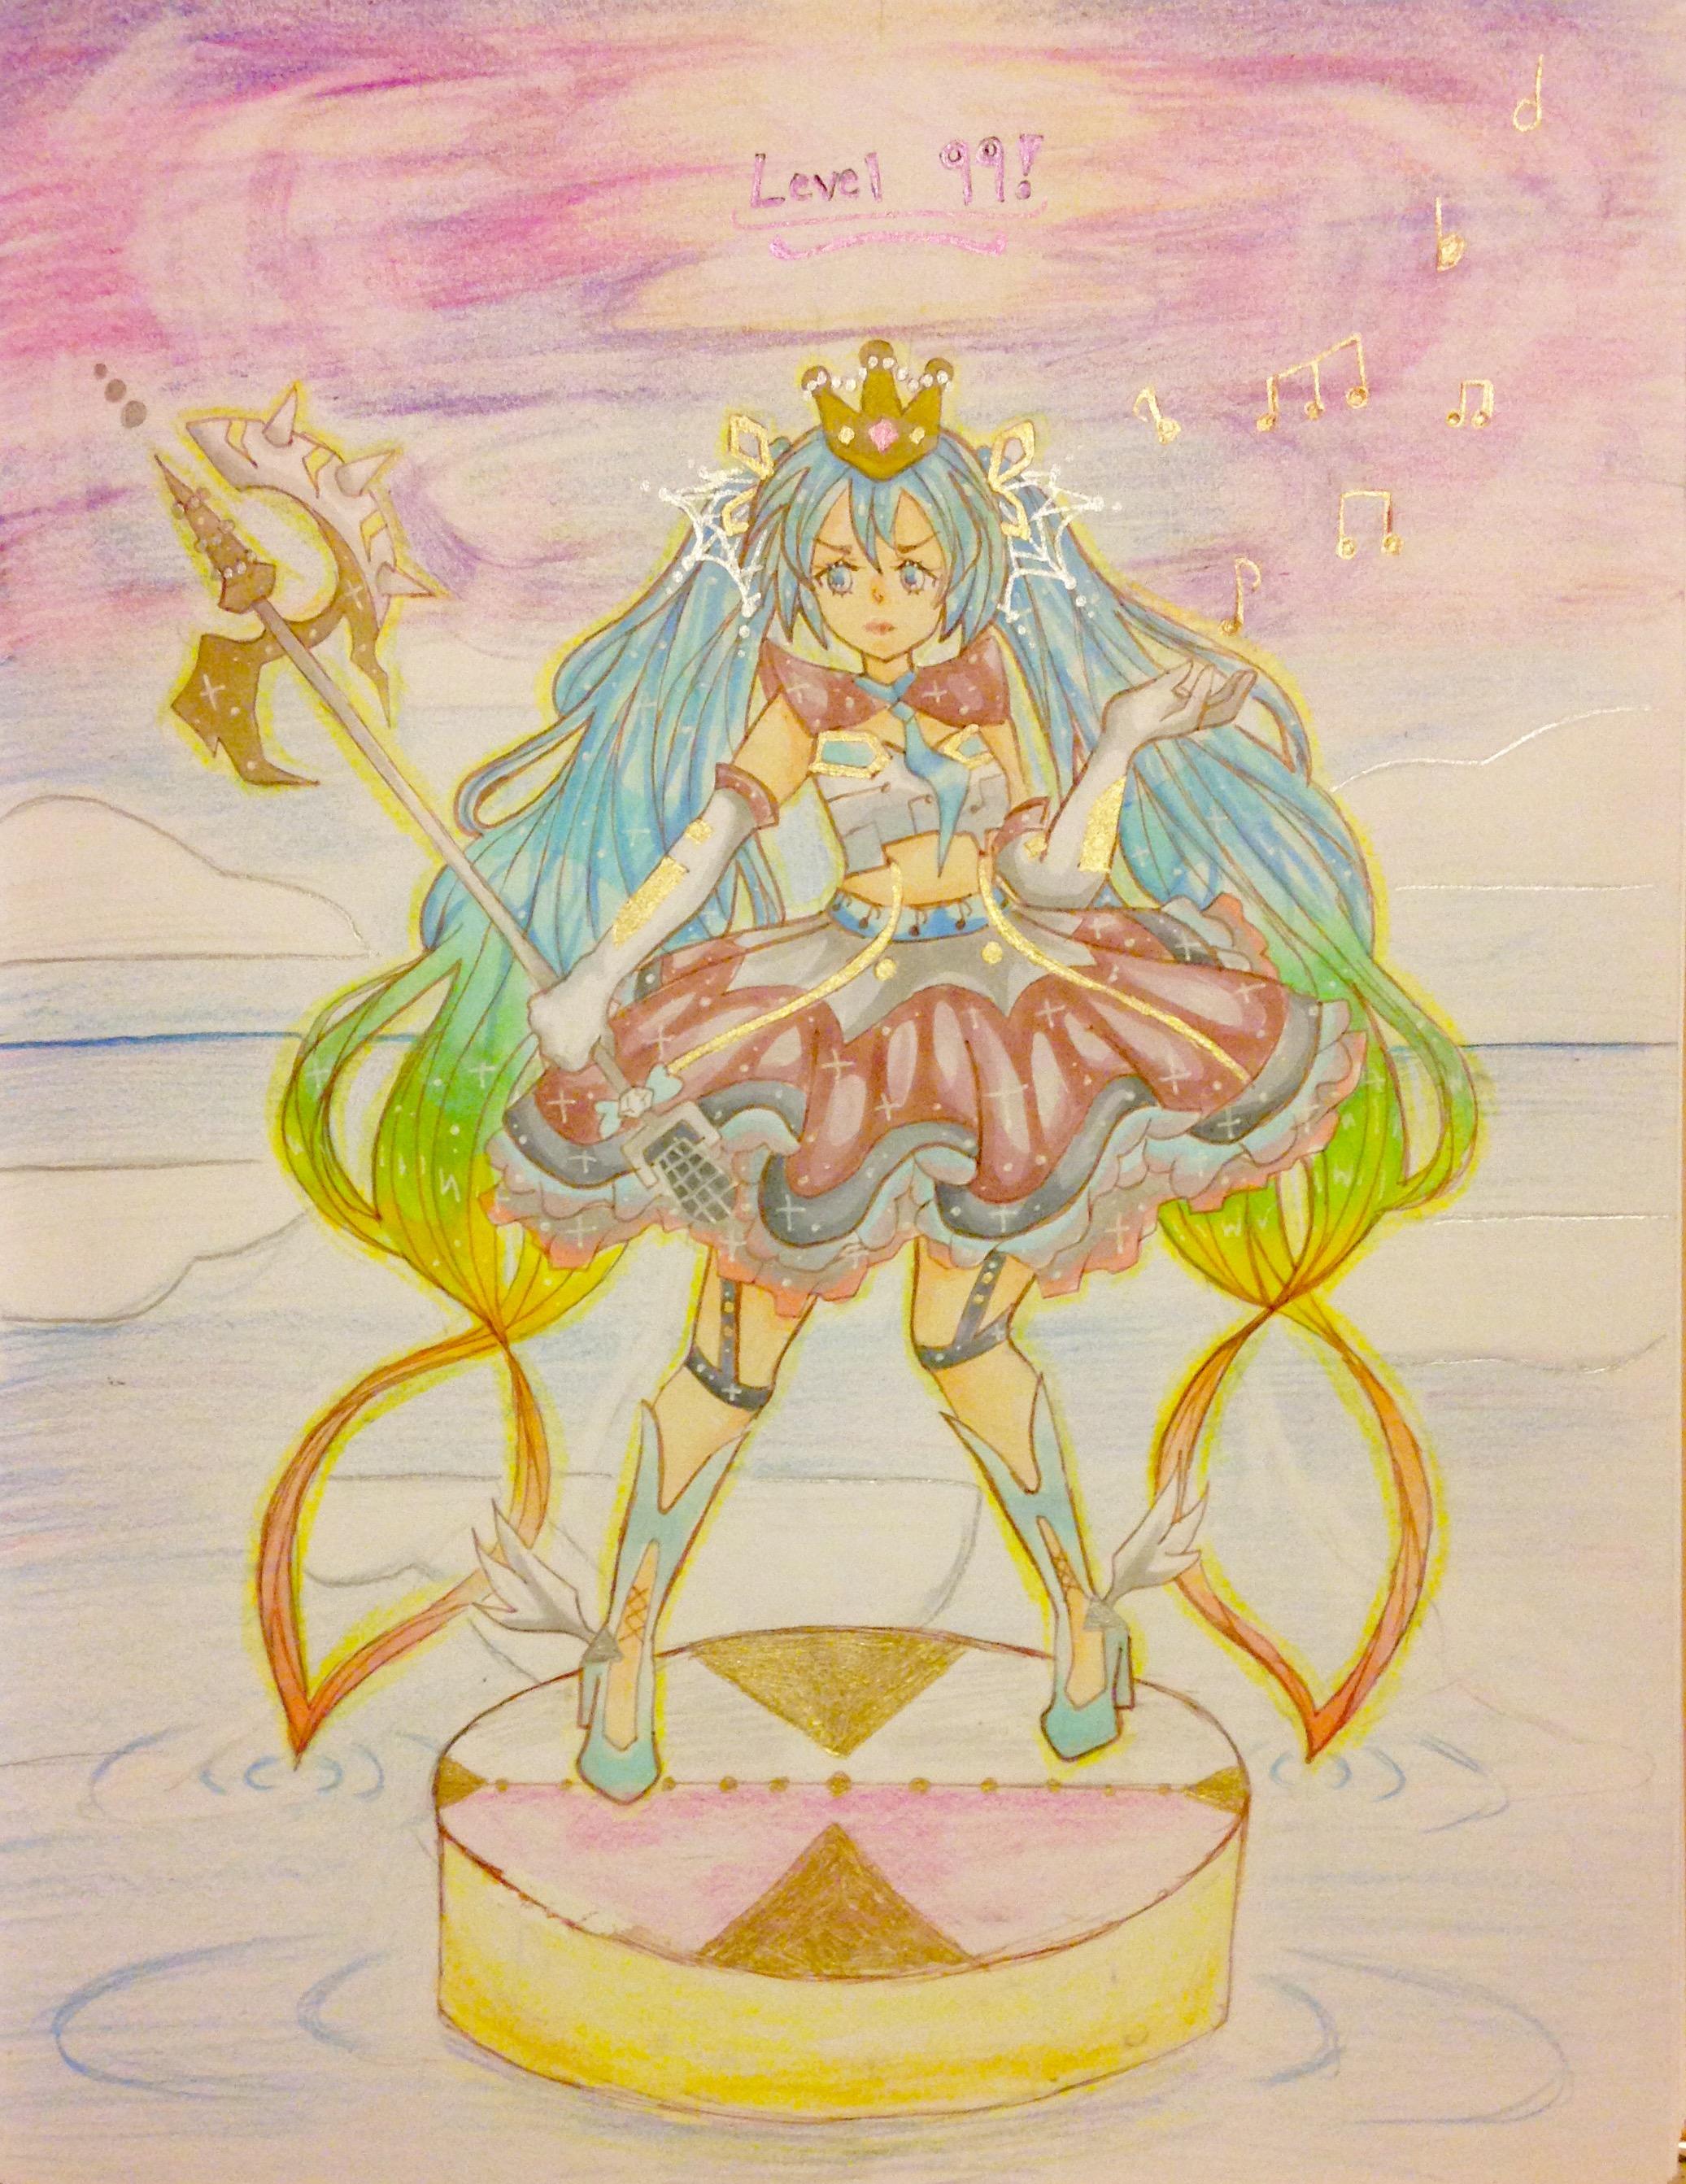 Lvl 99 Rainbow Miku!